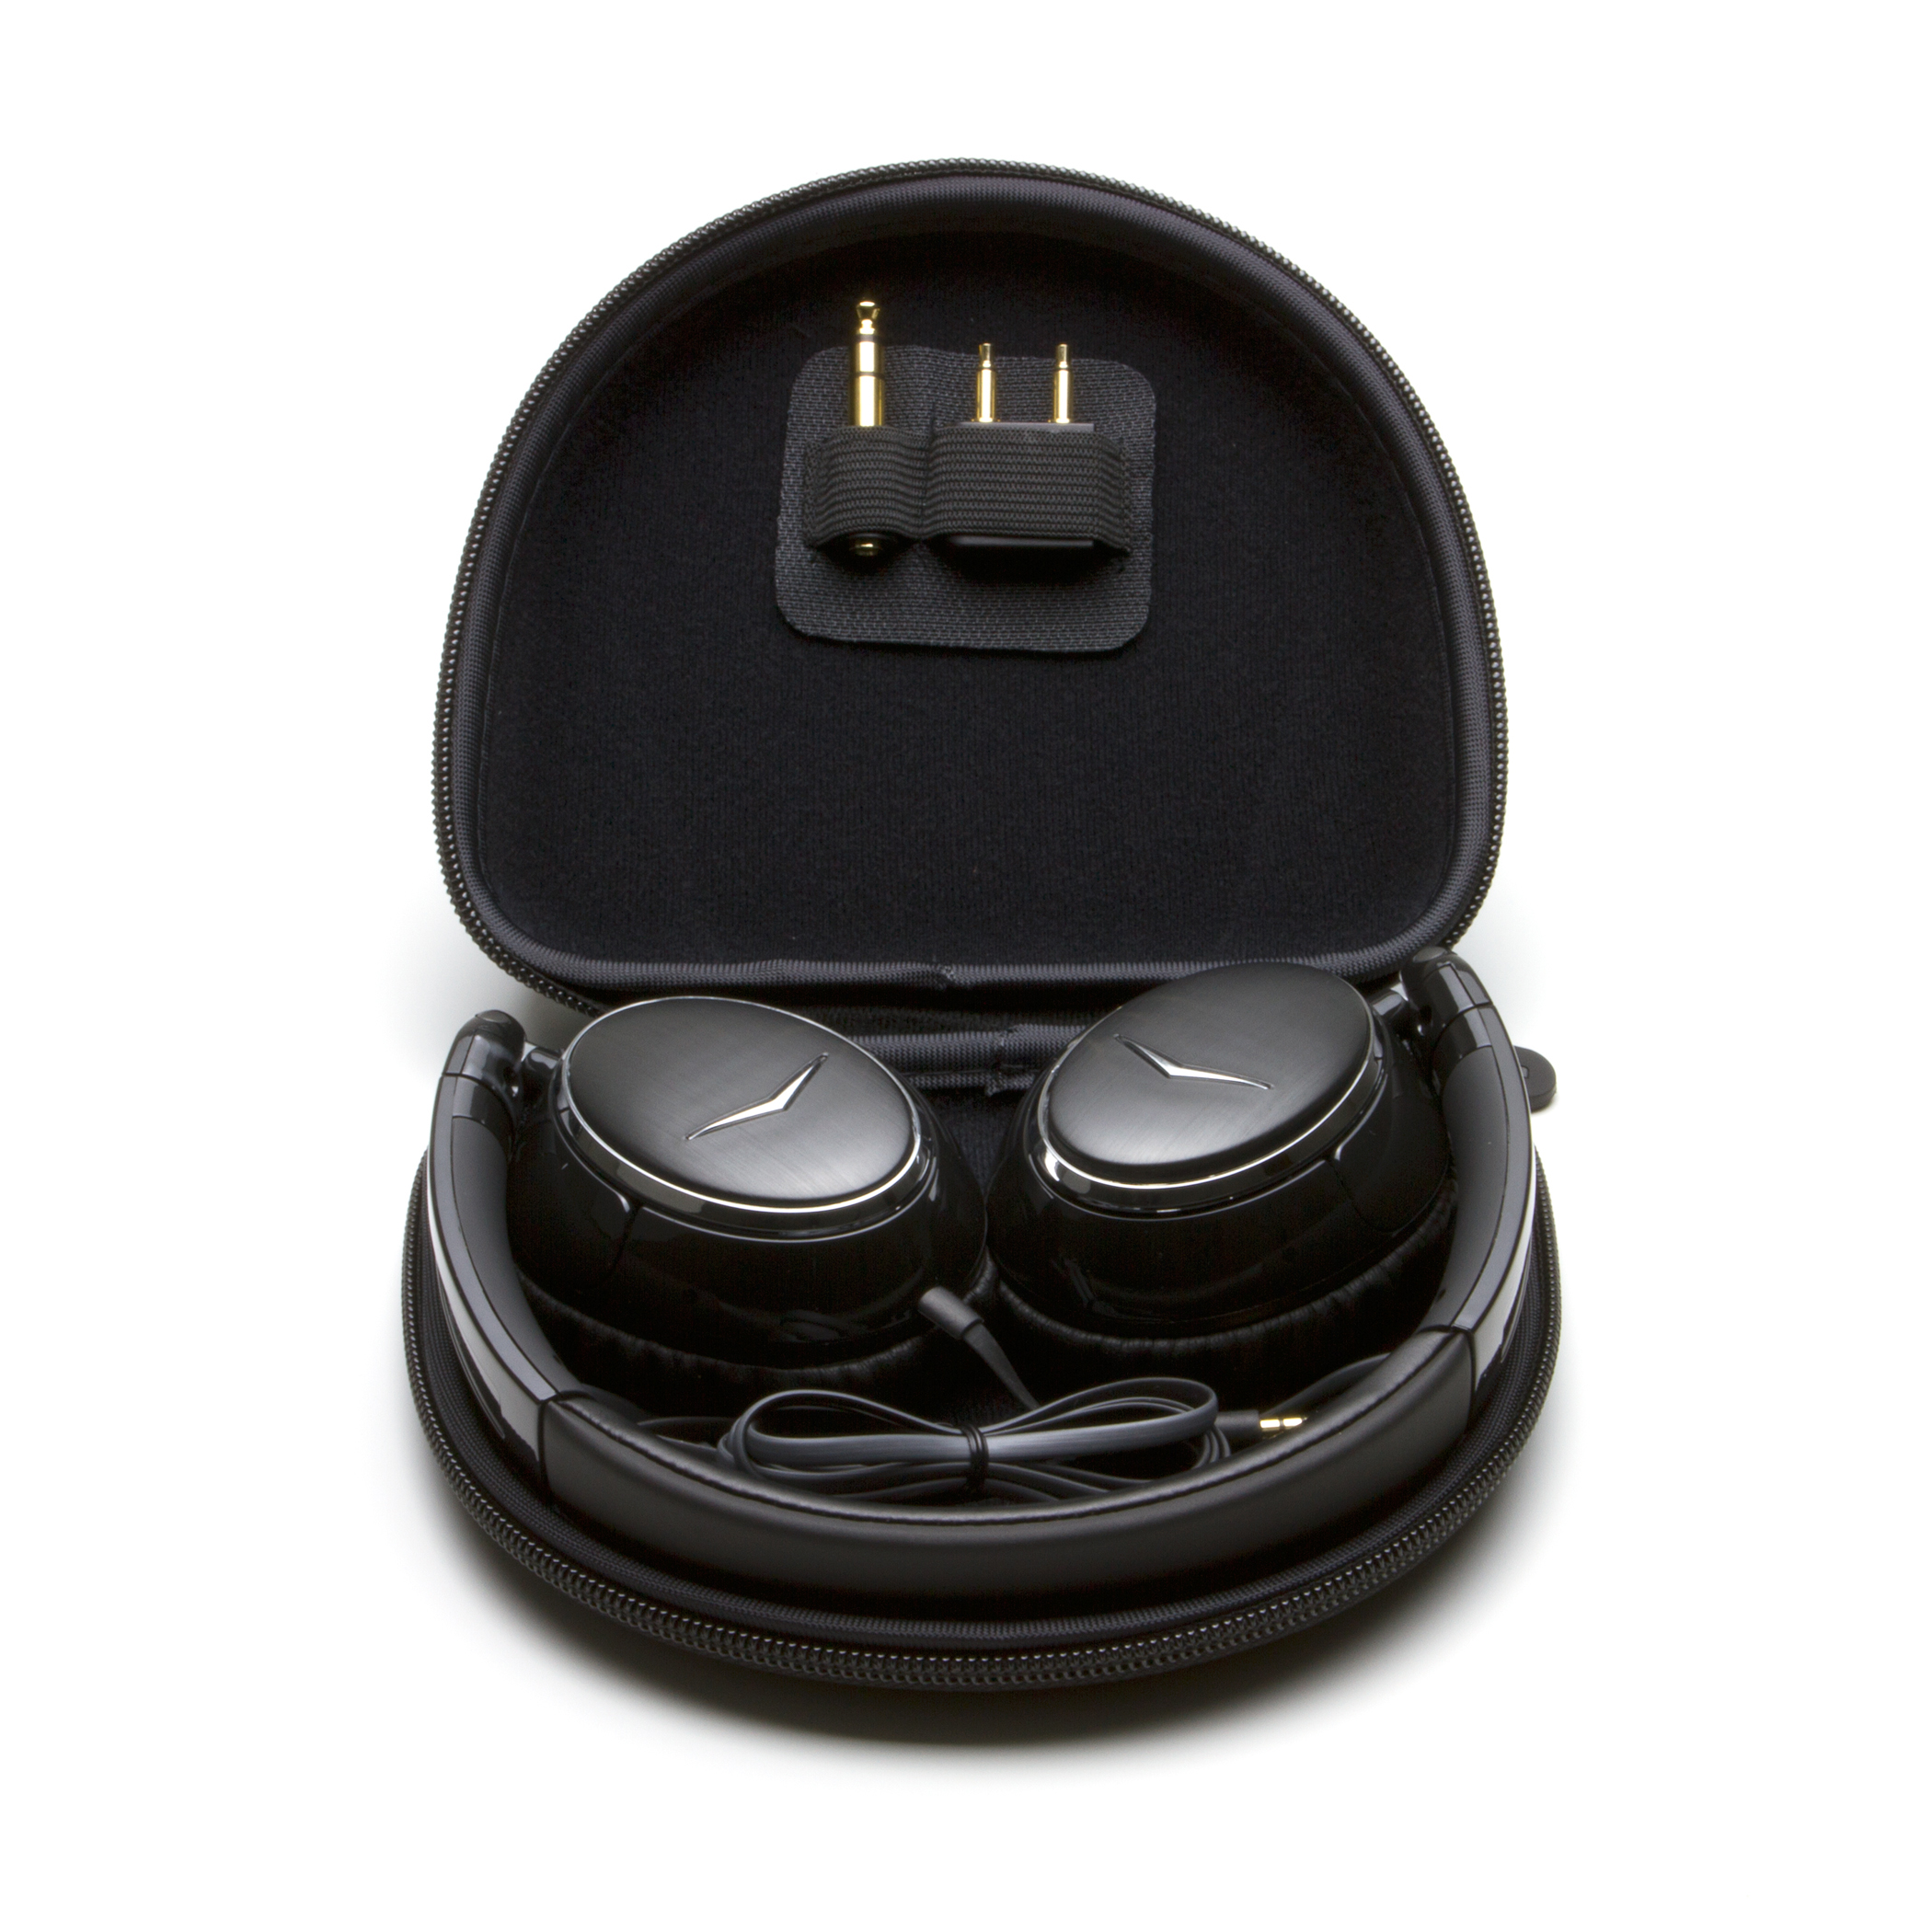 Image One Ii Stereo Headphones Klipsch Headphone Wiring Diagram Added Frills